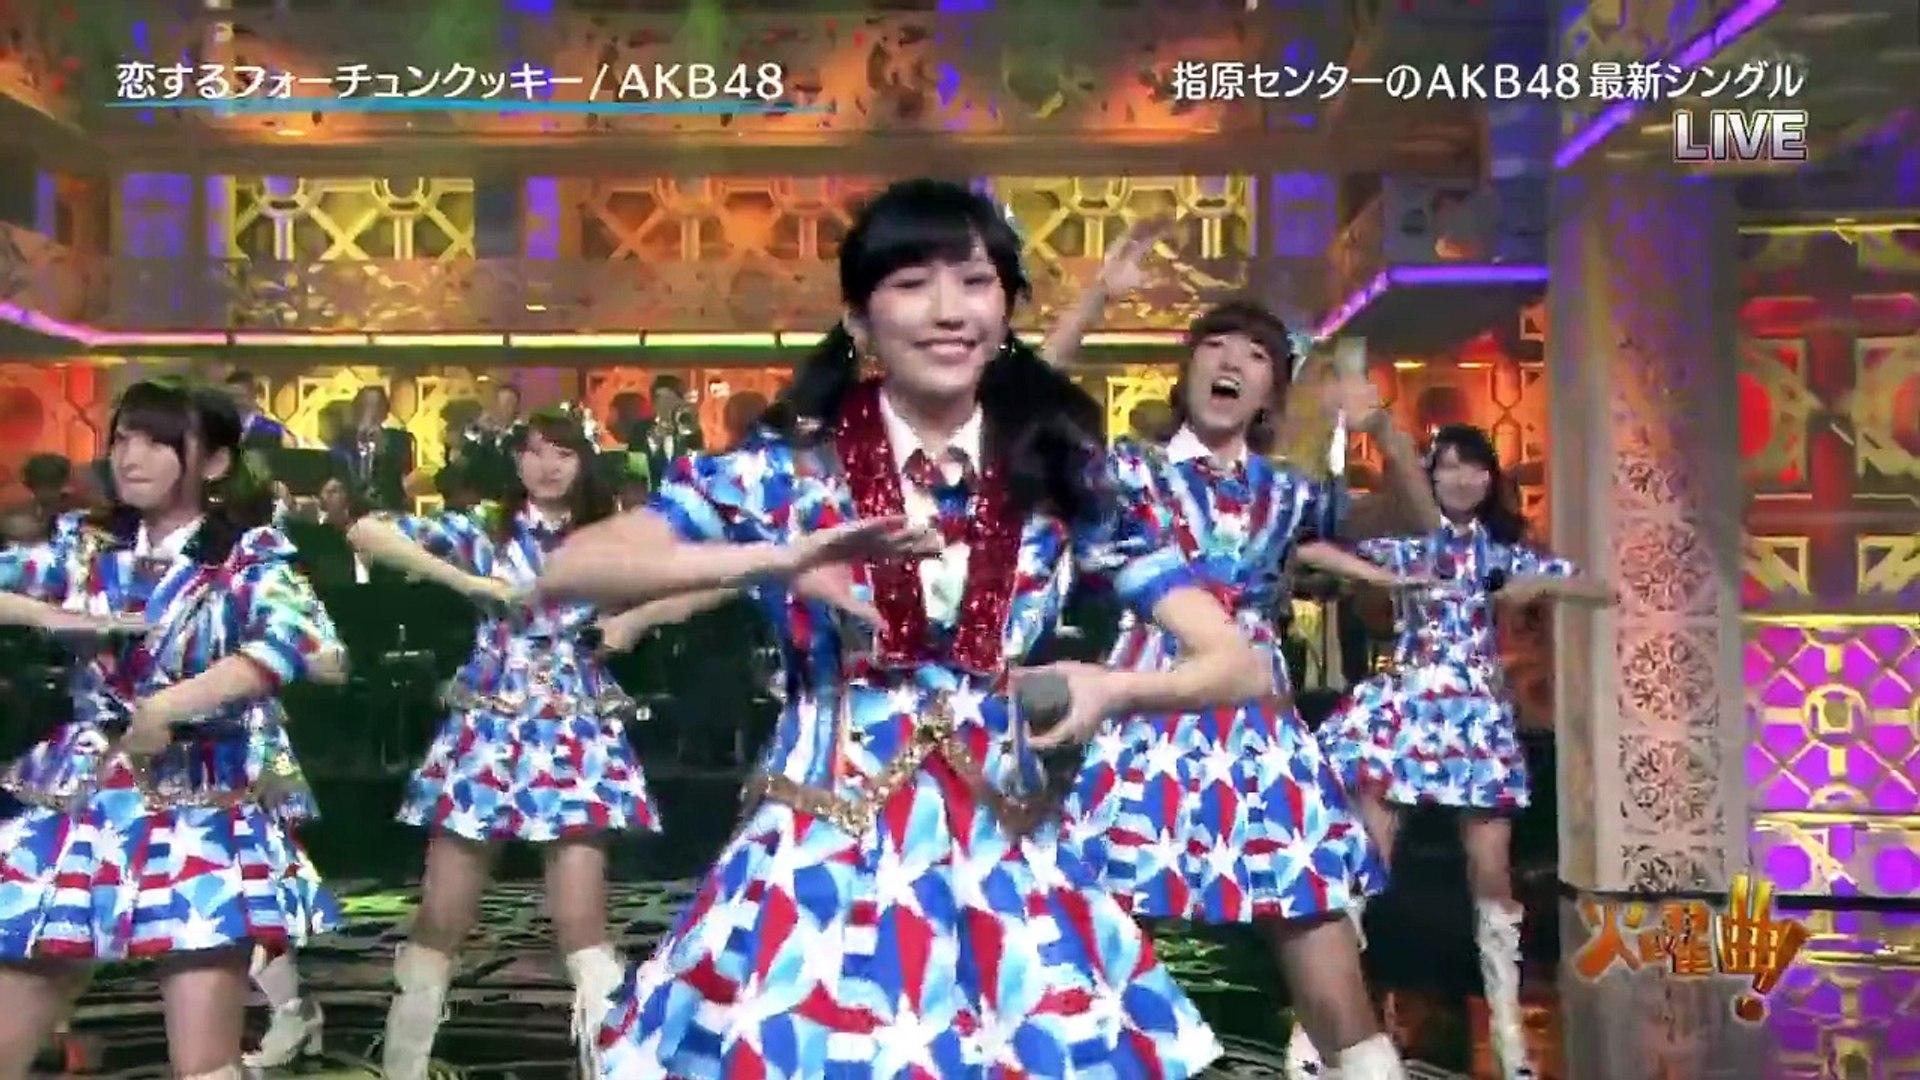 AKB48 [LIVE] Koisuru Fortune Cookie - Give Me Five 130903